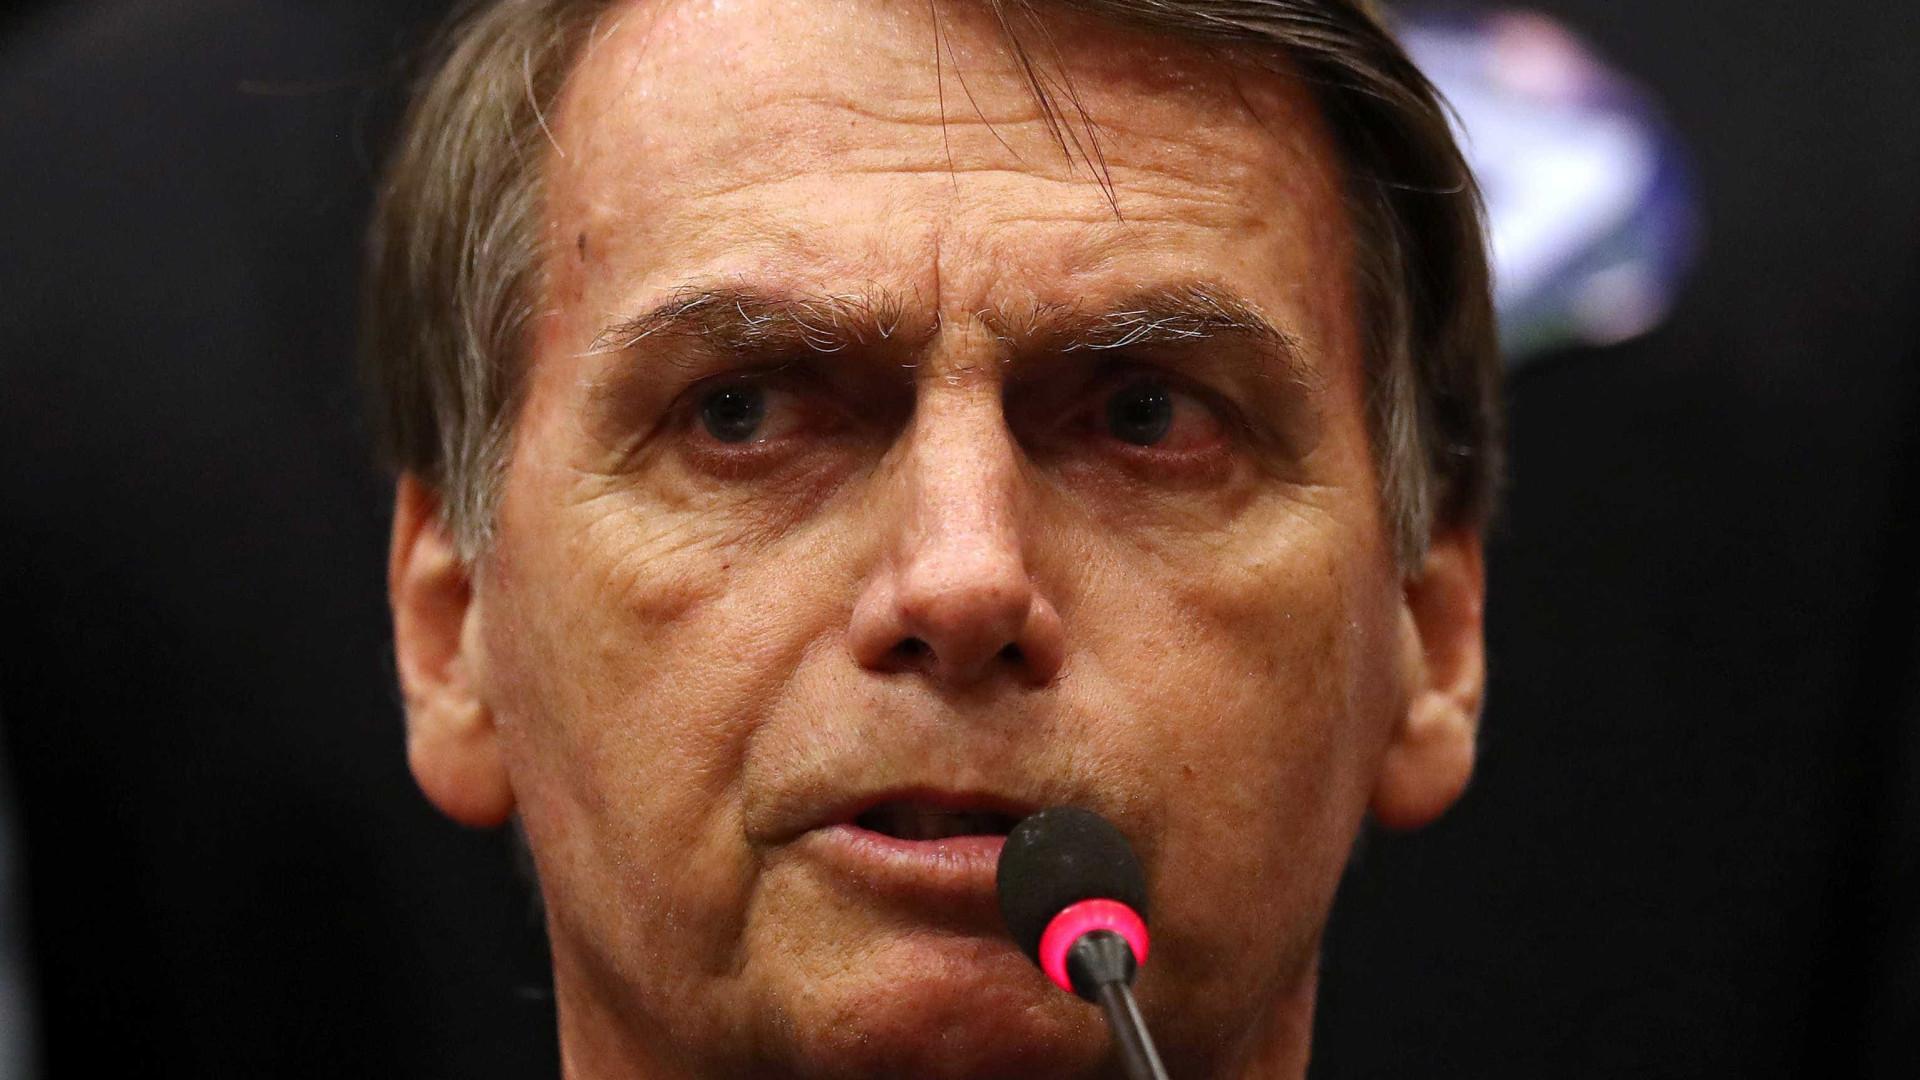 Bolsonaro cita 'apoio voluntário' ao falar sobre empresas no WhatsApp